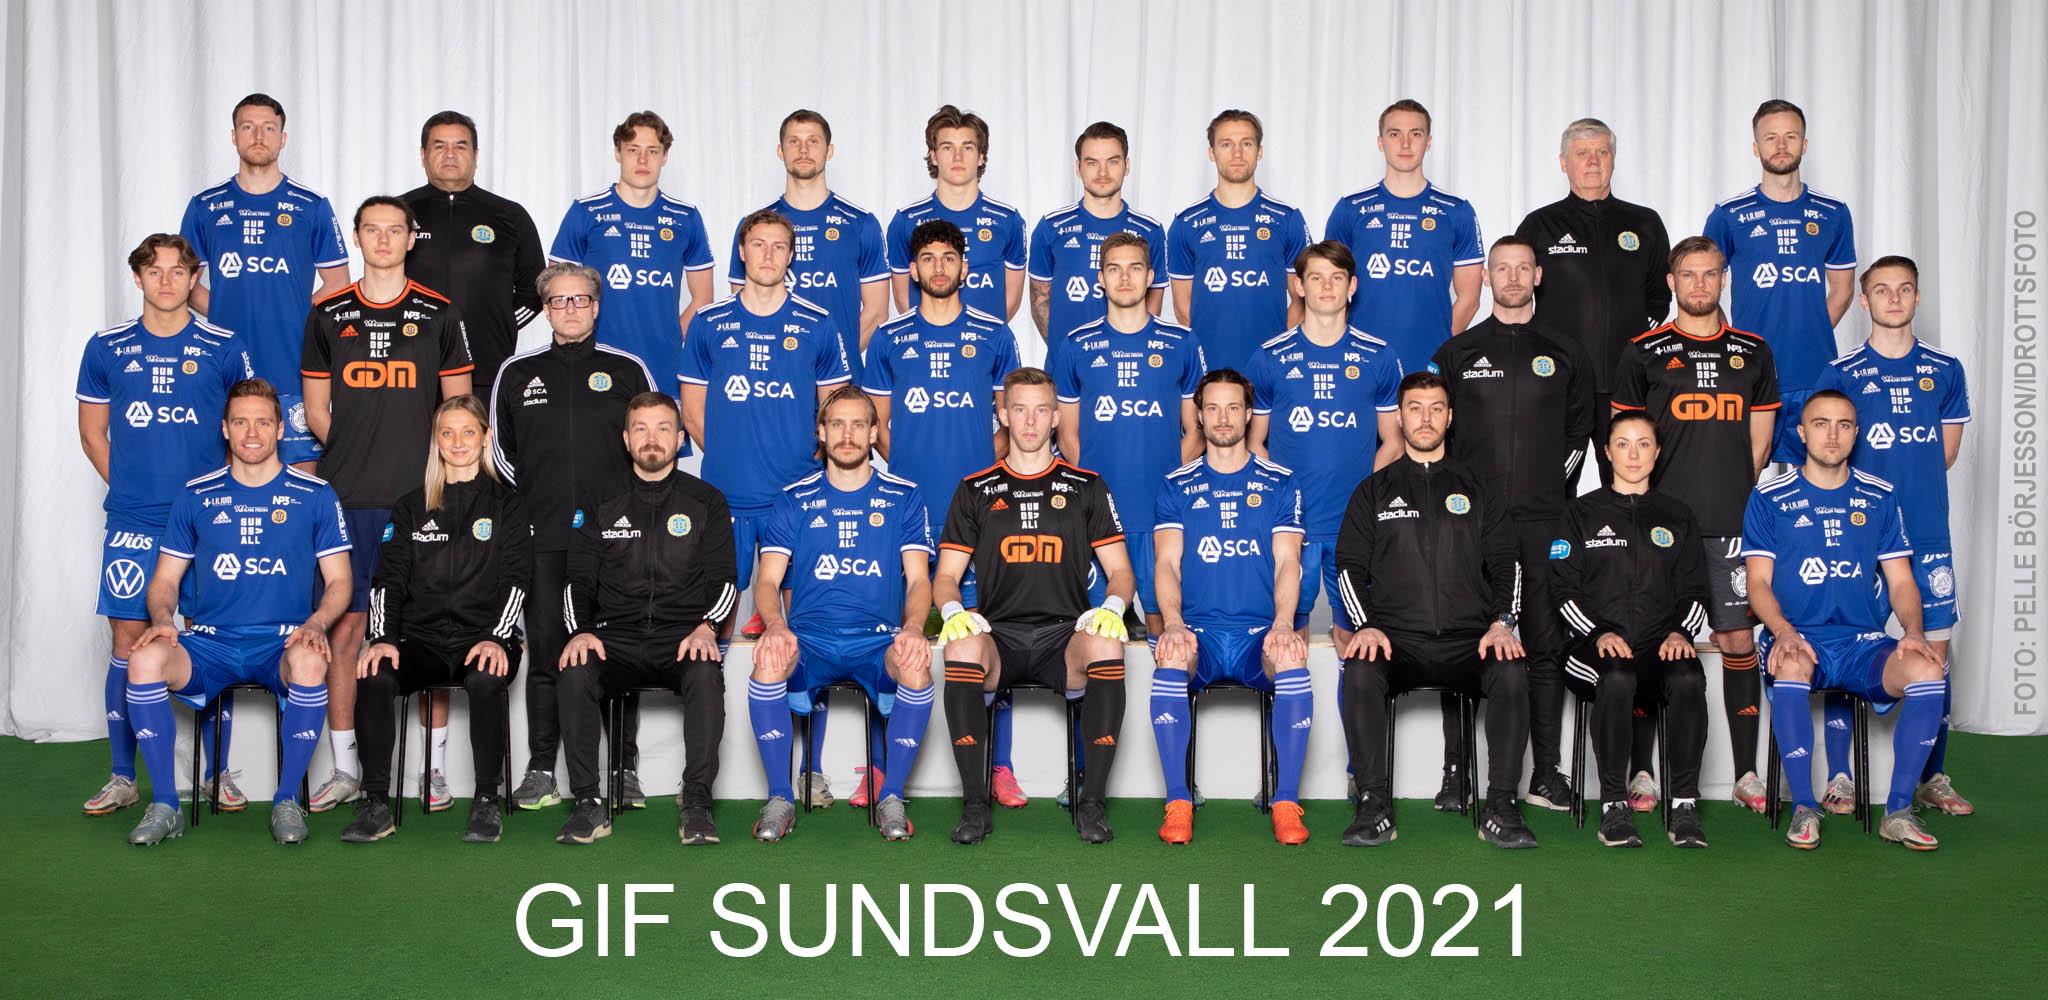 GIF Sundsvall lagbild 2021